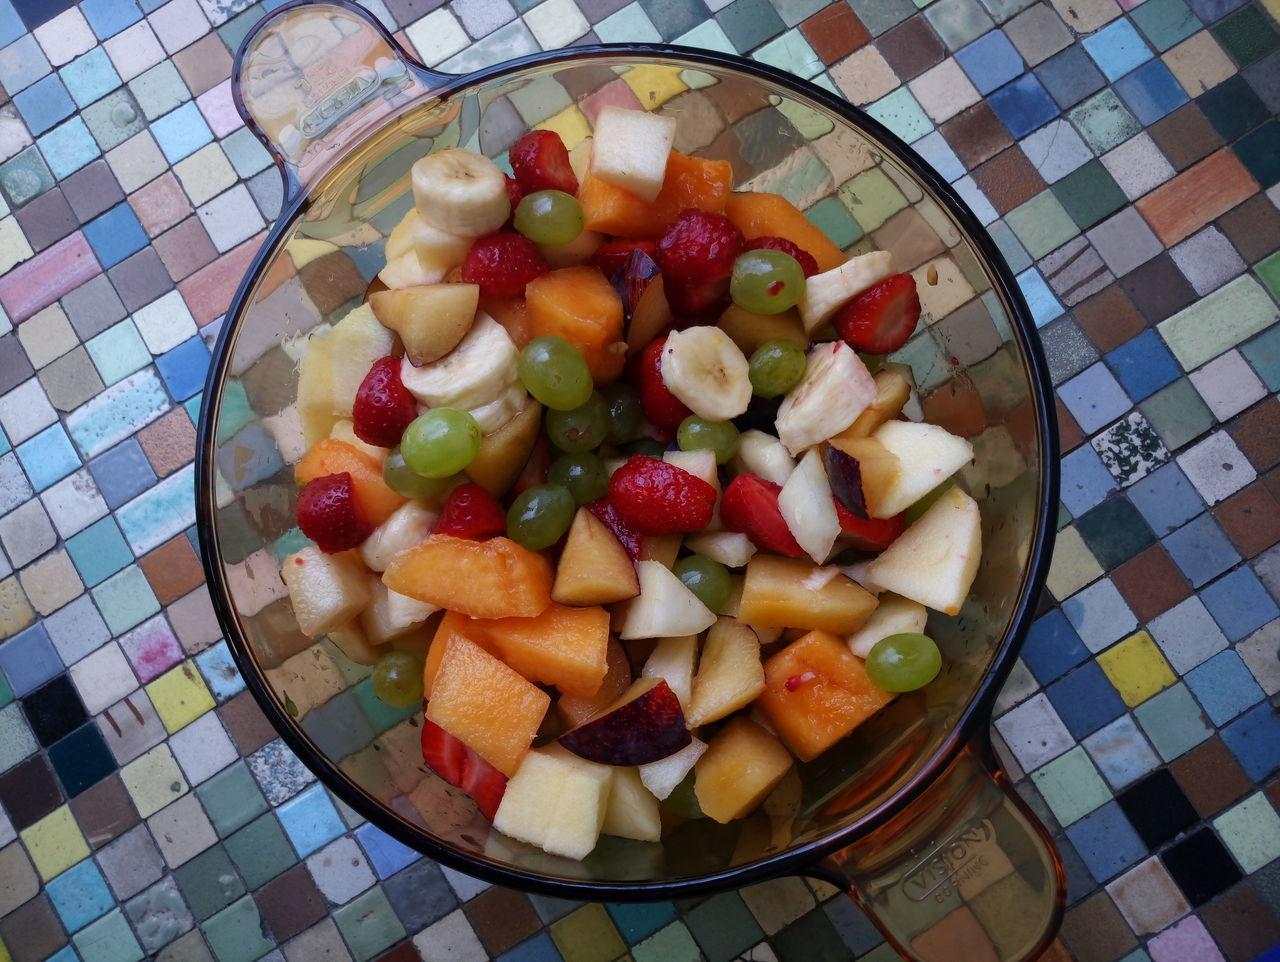 Fruit Fruitsalad Enjoying Life Mix Fruit Colours Nofilter No People Springtime